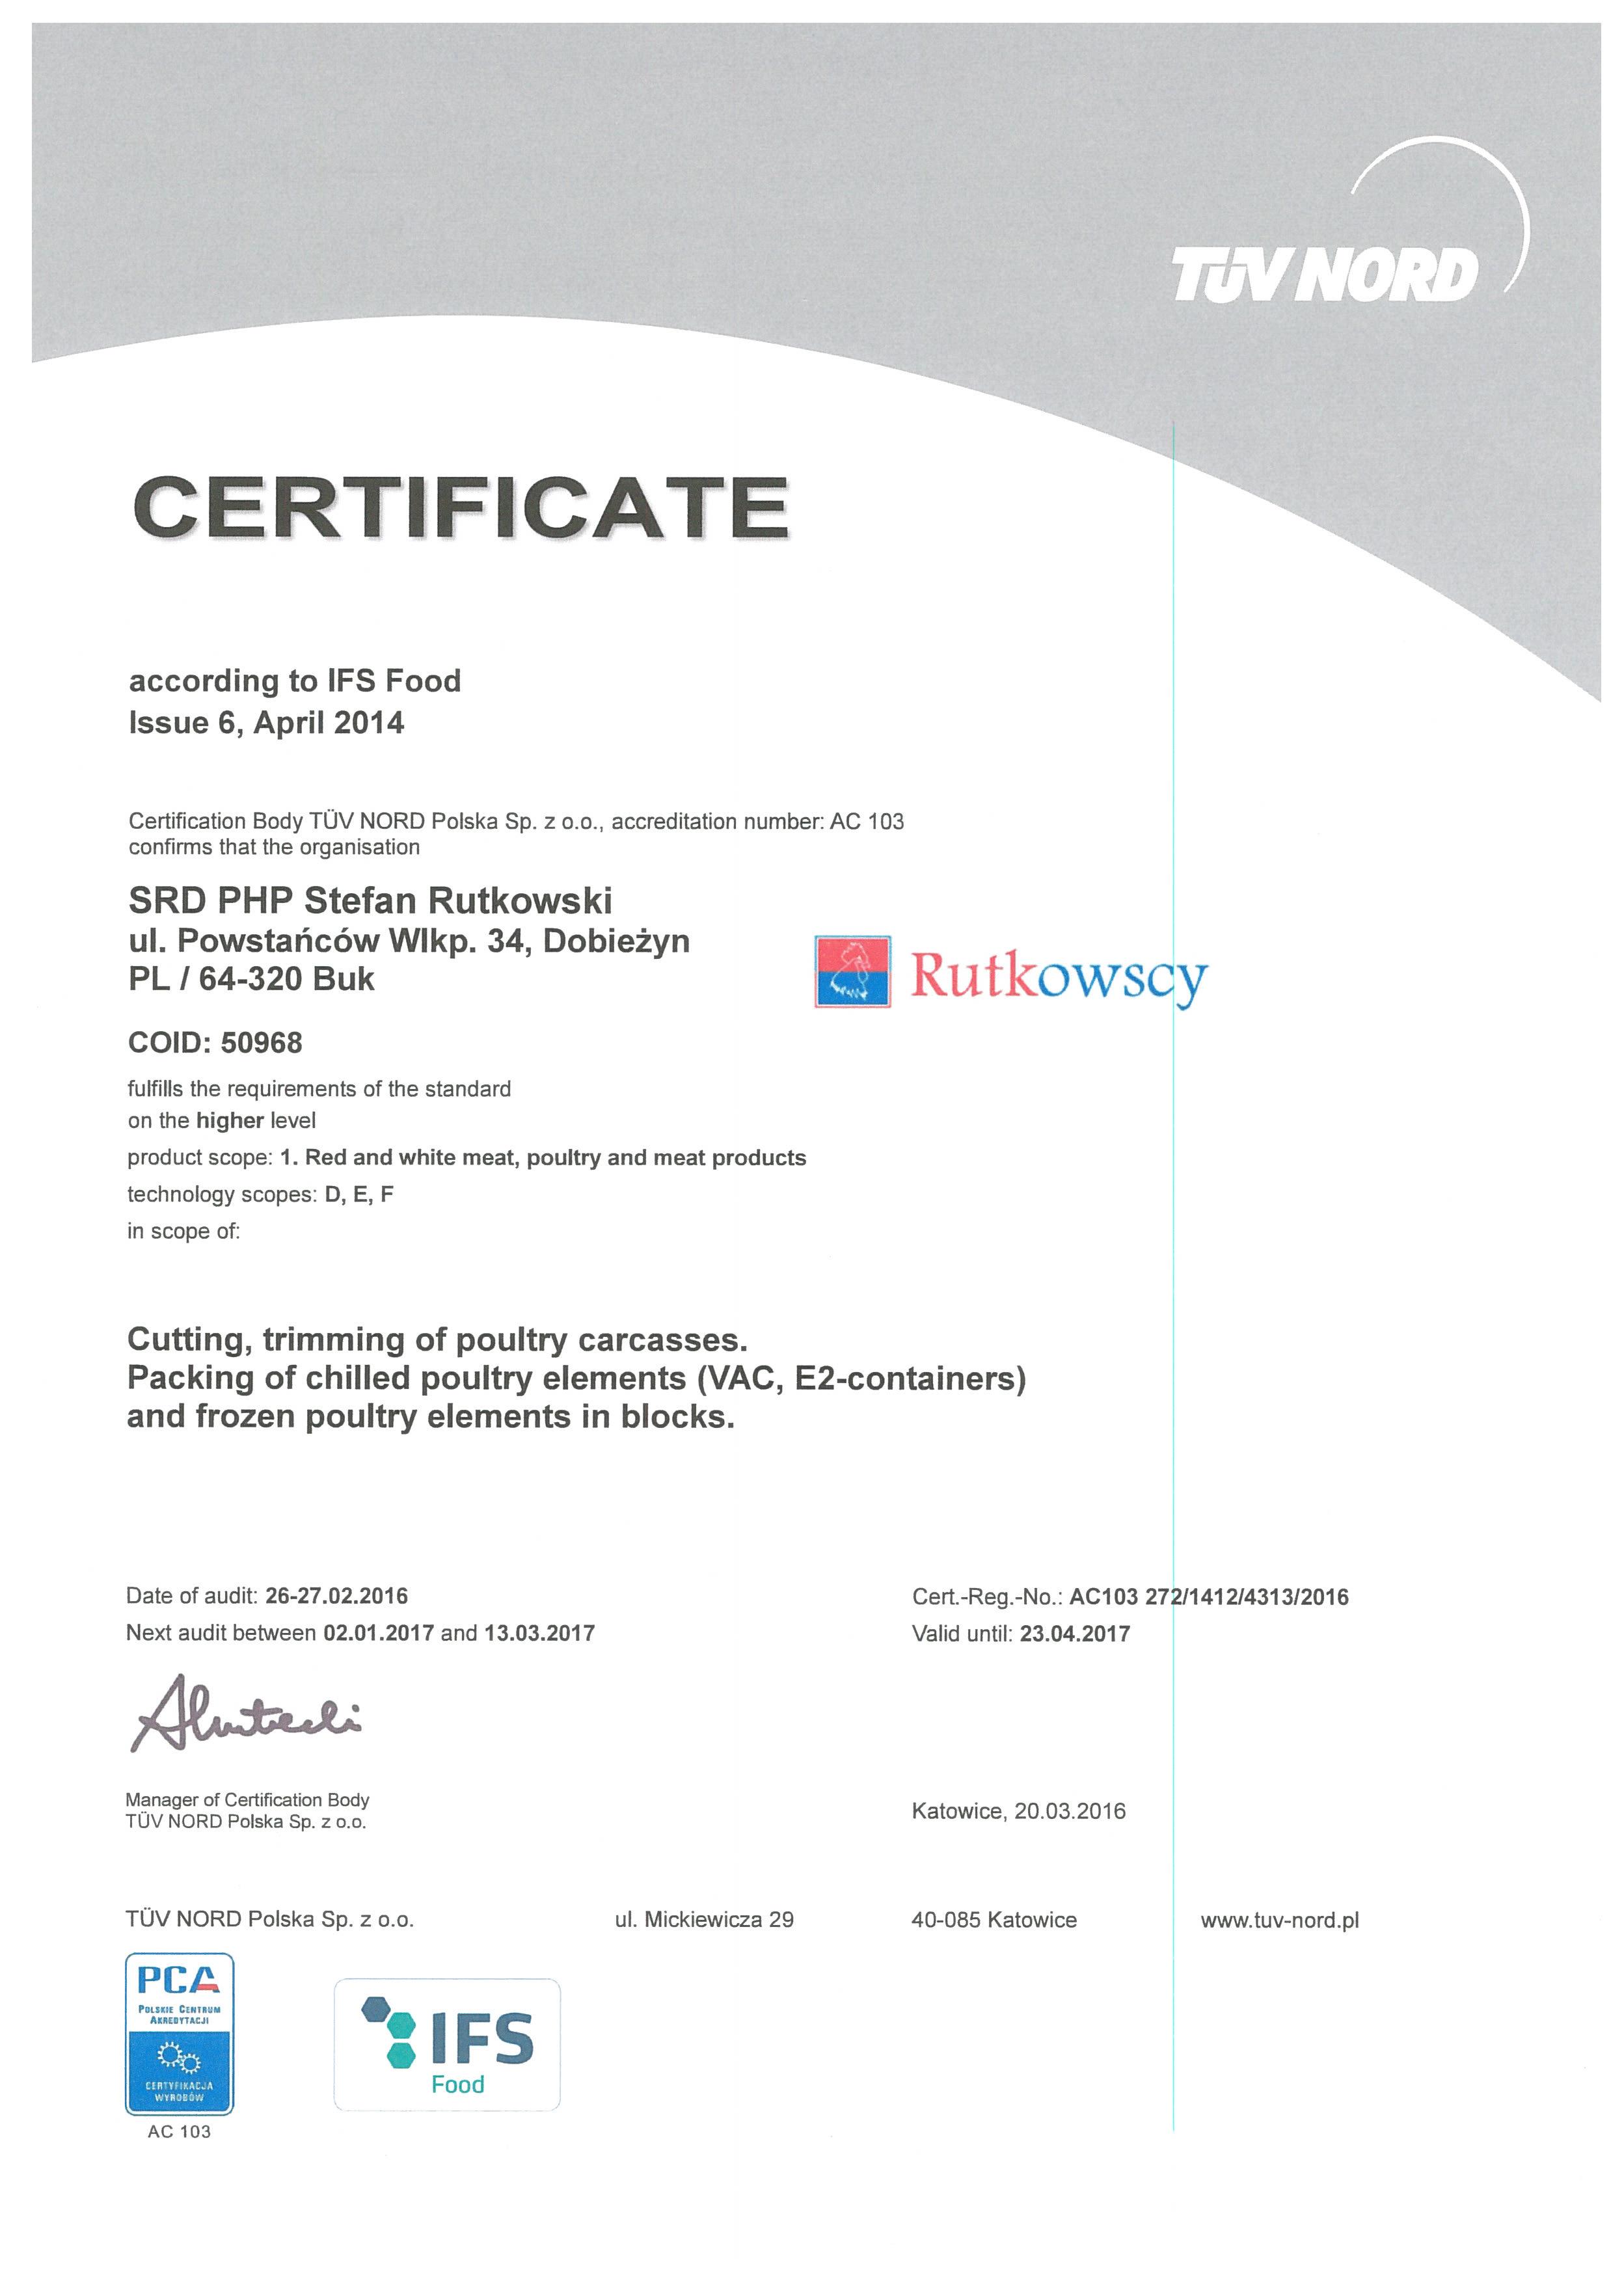 SRD PHP IFS 2016 (3) certyfikat angl